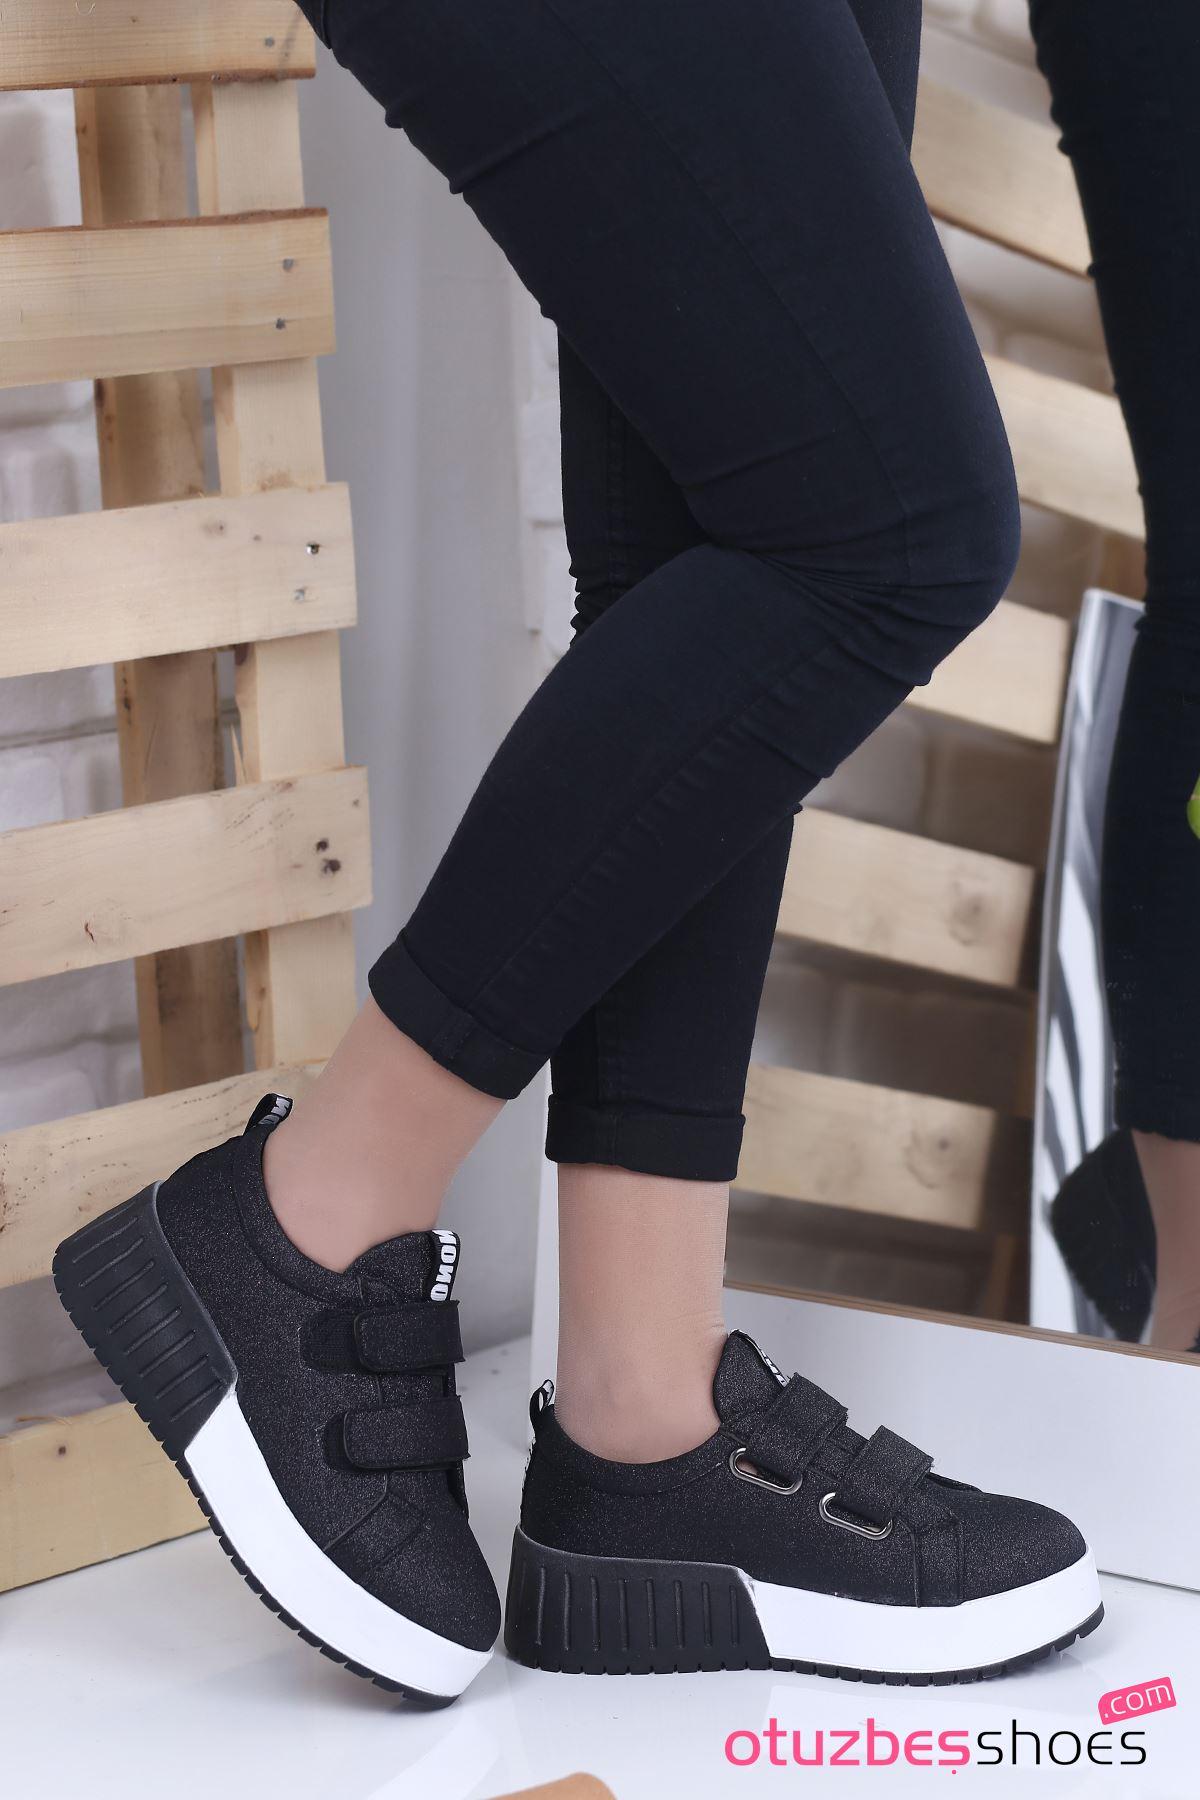 Mosso Simli Cırt Detay Spor Ayakkabı Siyah